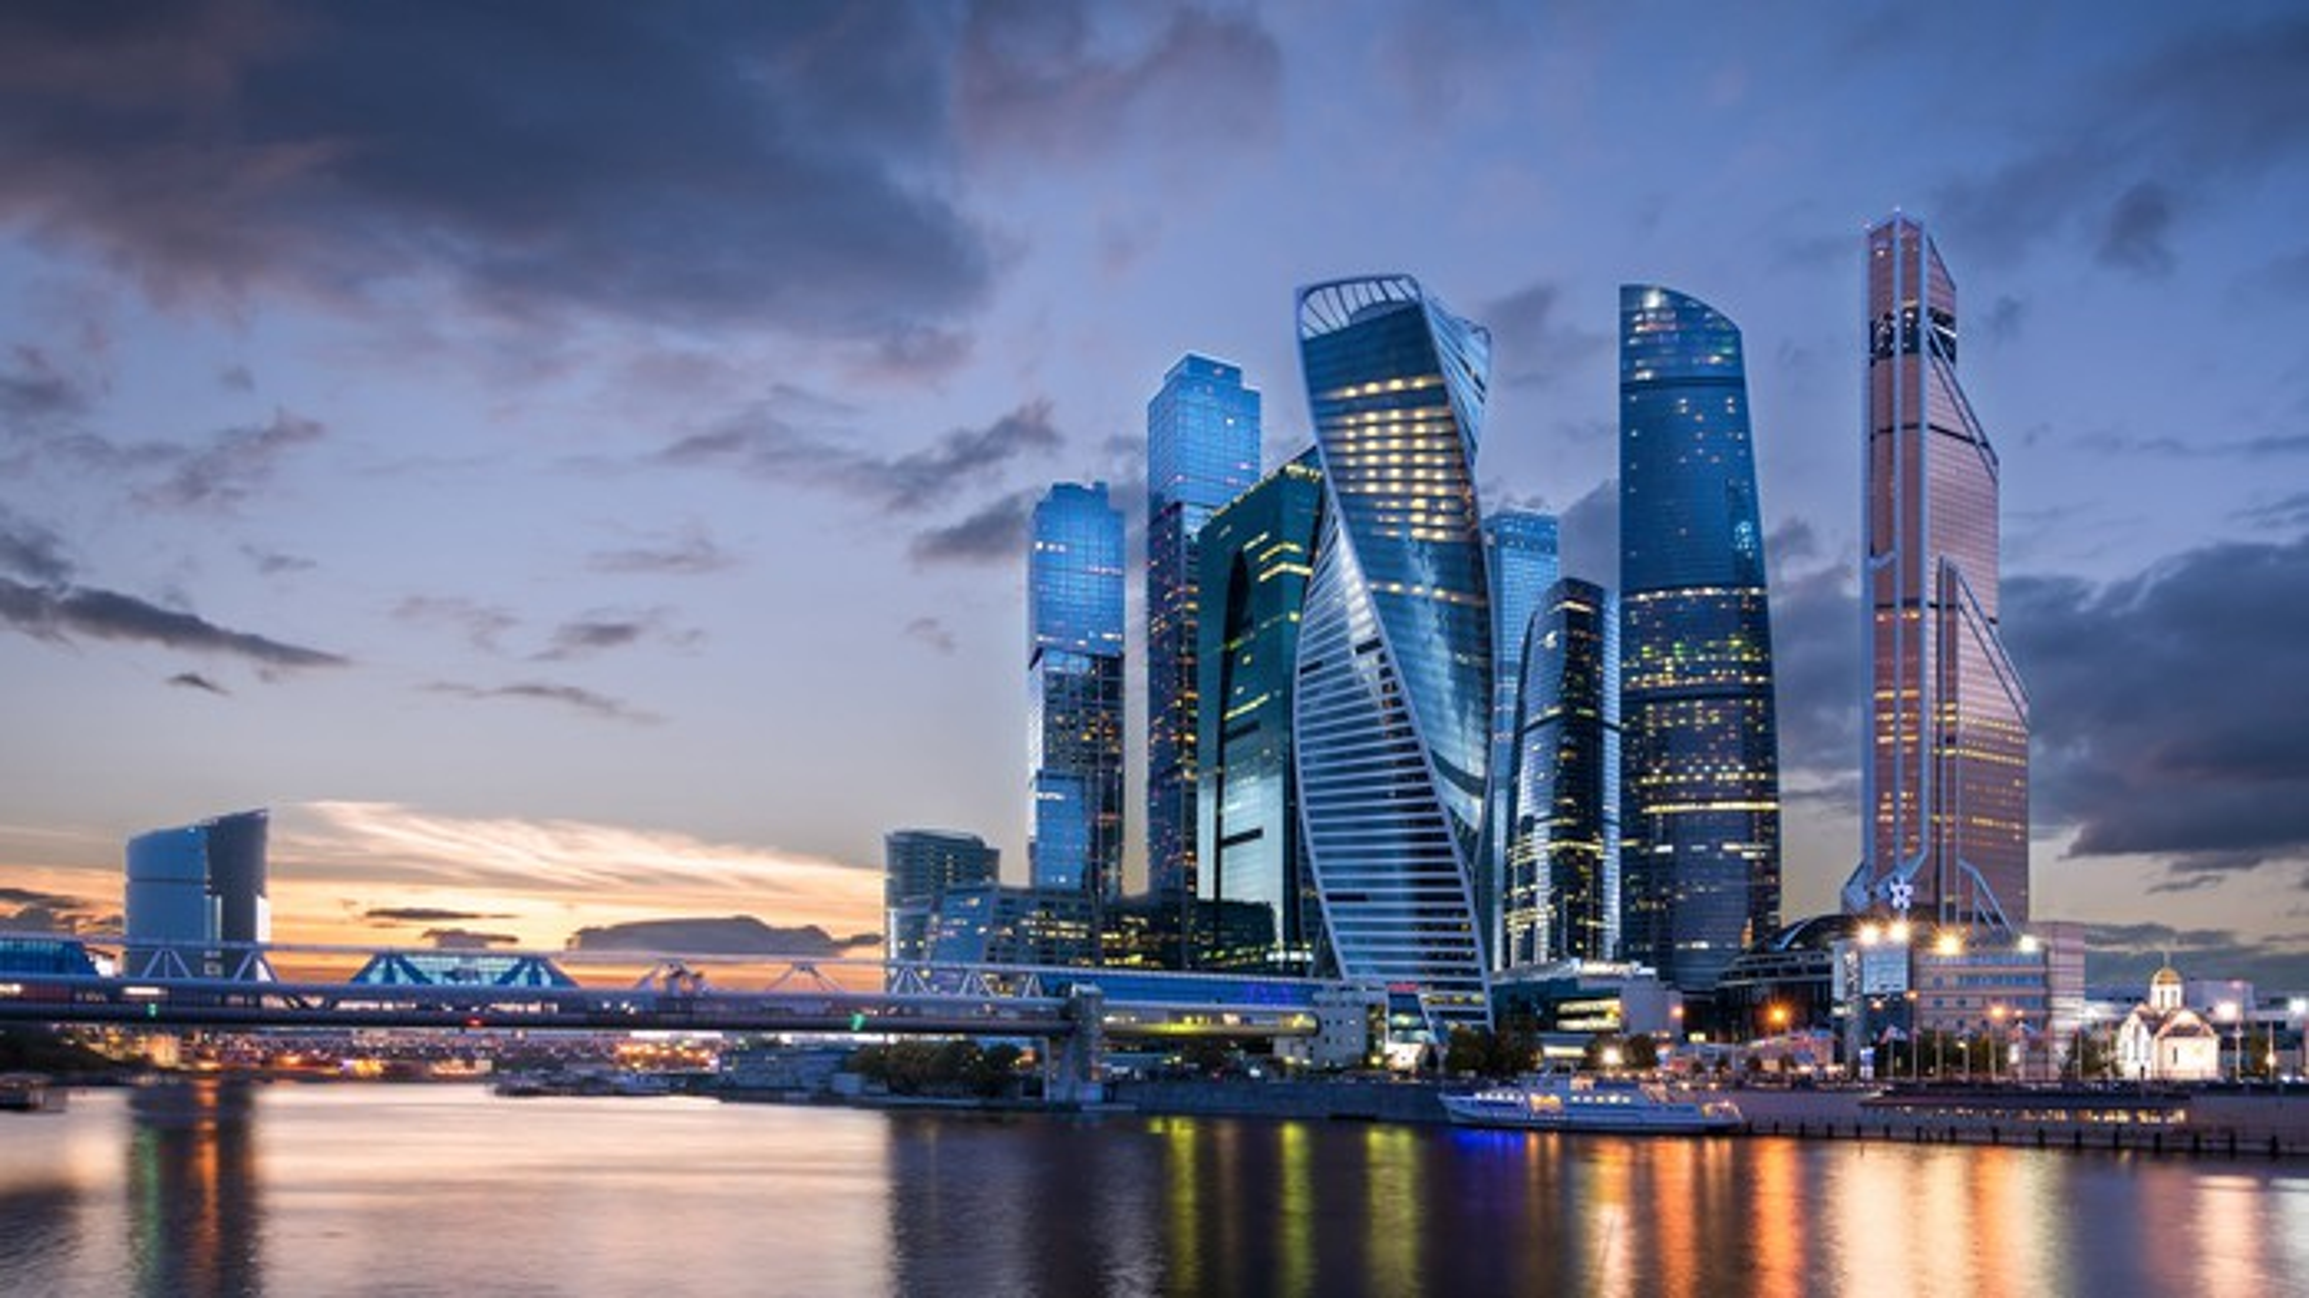 Moscow's skyline.